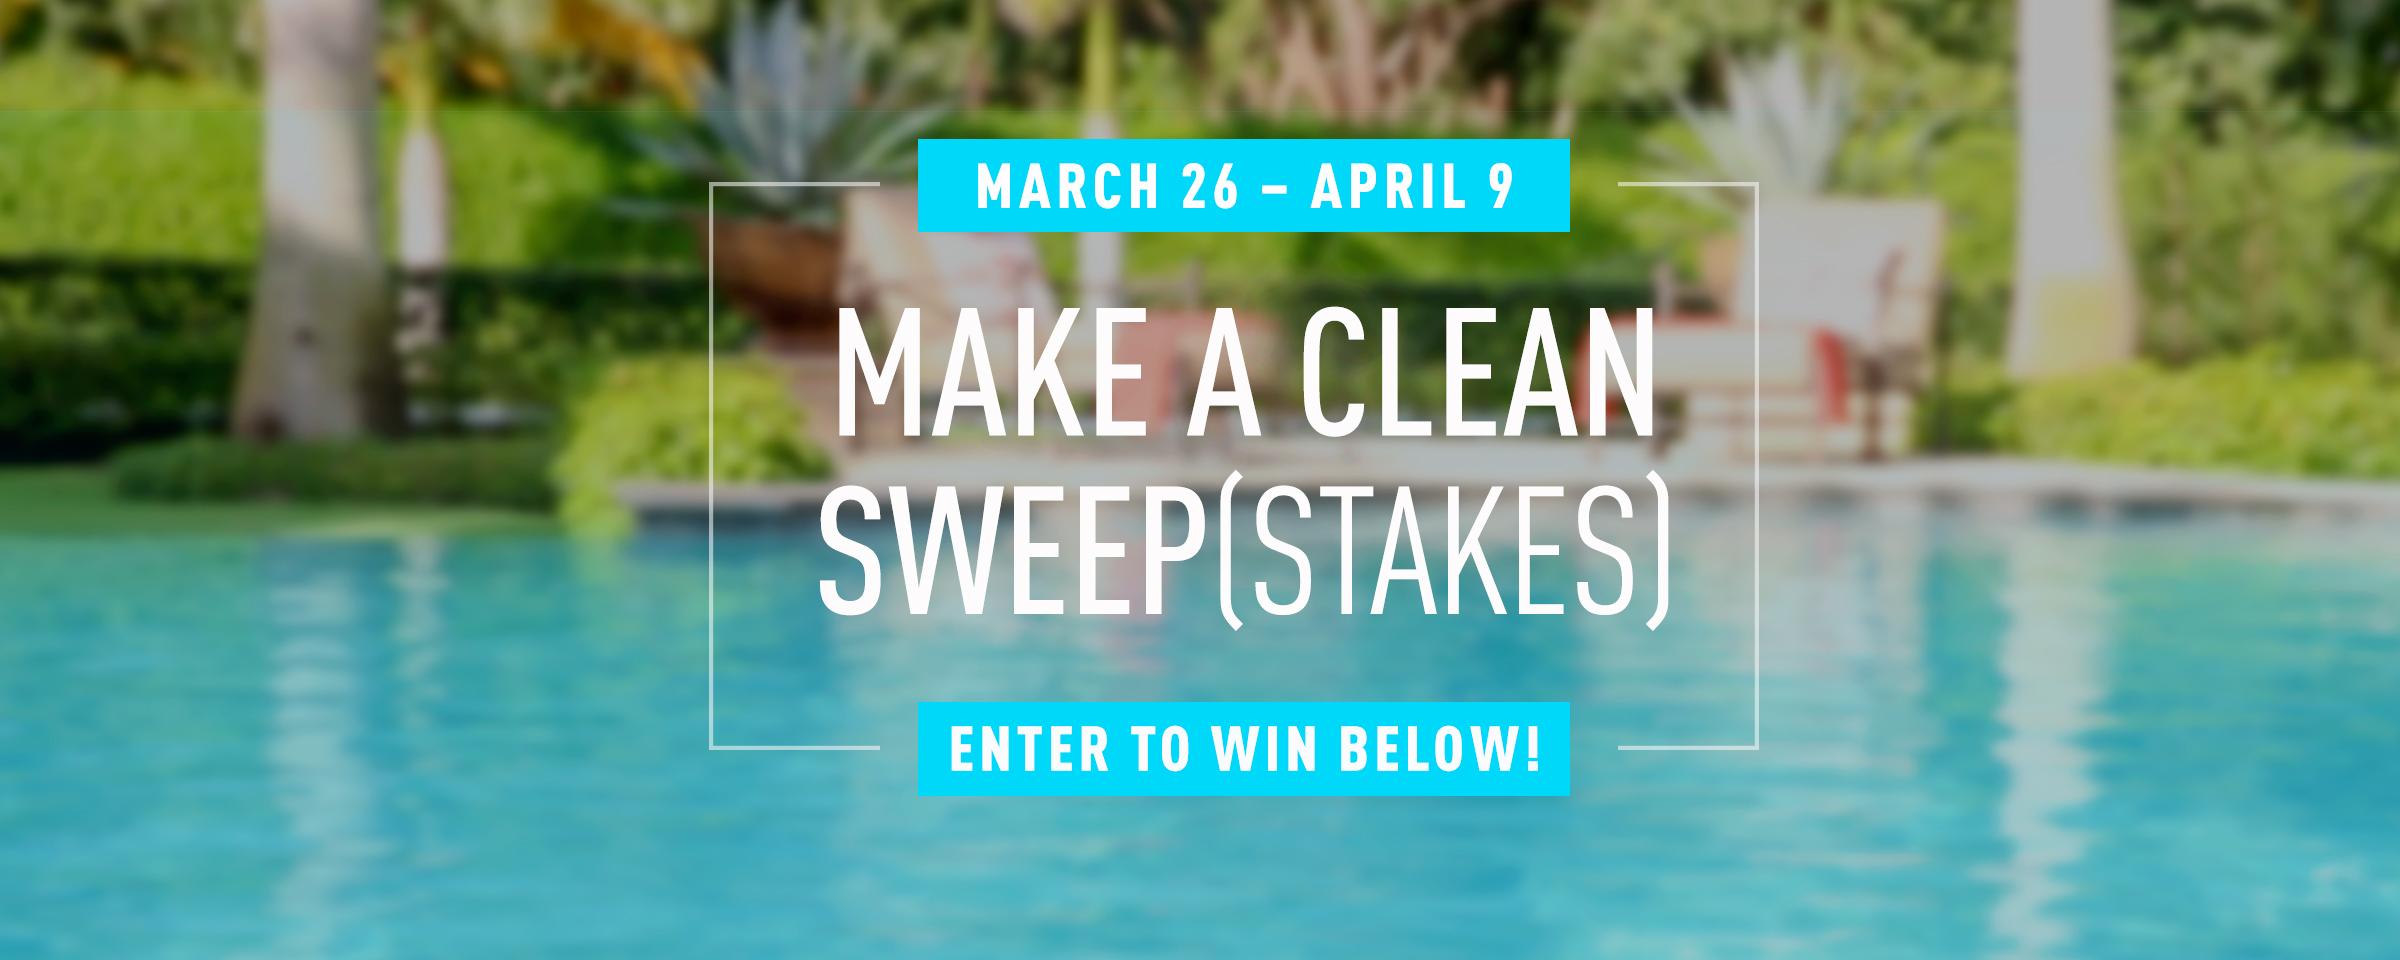 Make a Clean Sweep(stakes)